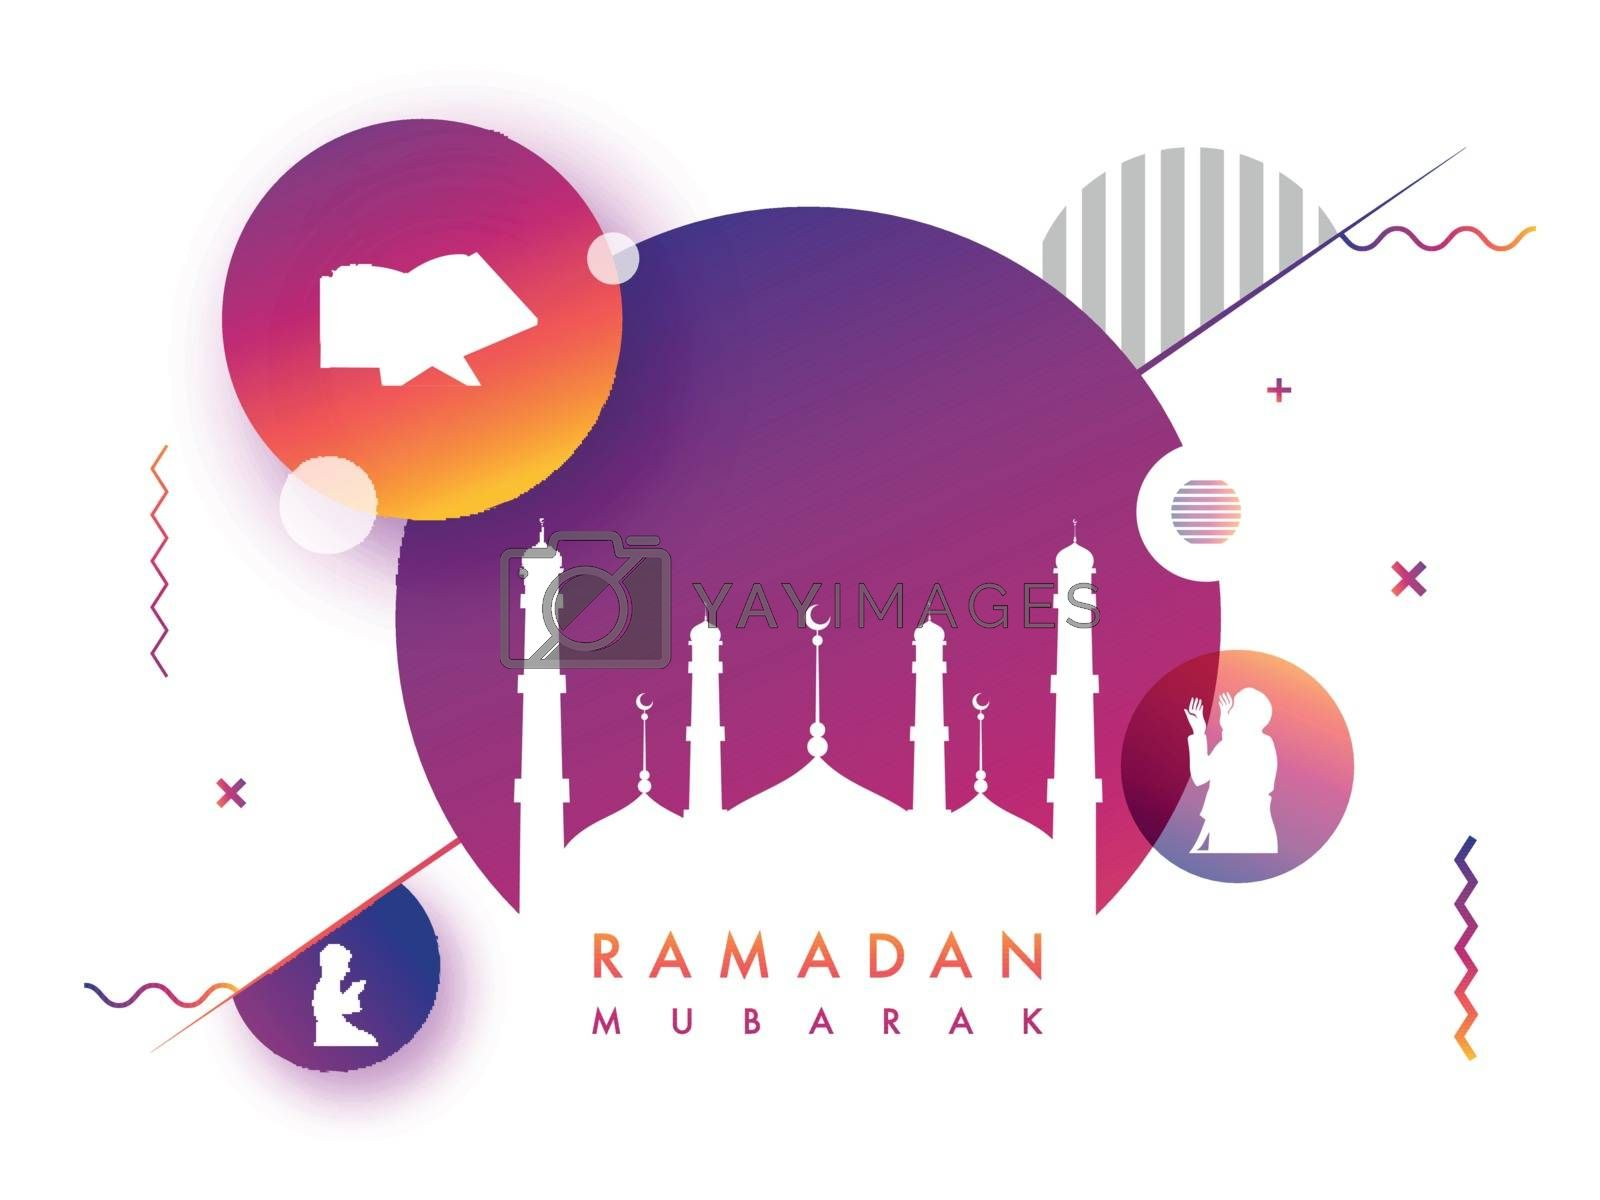 Ramadan Kareem banner with Islamic elements. by aispl